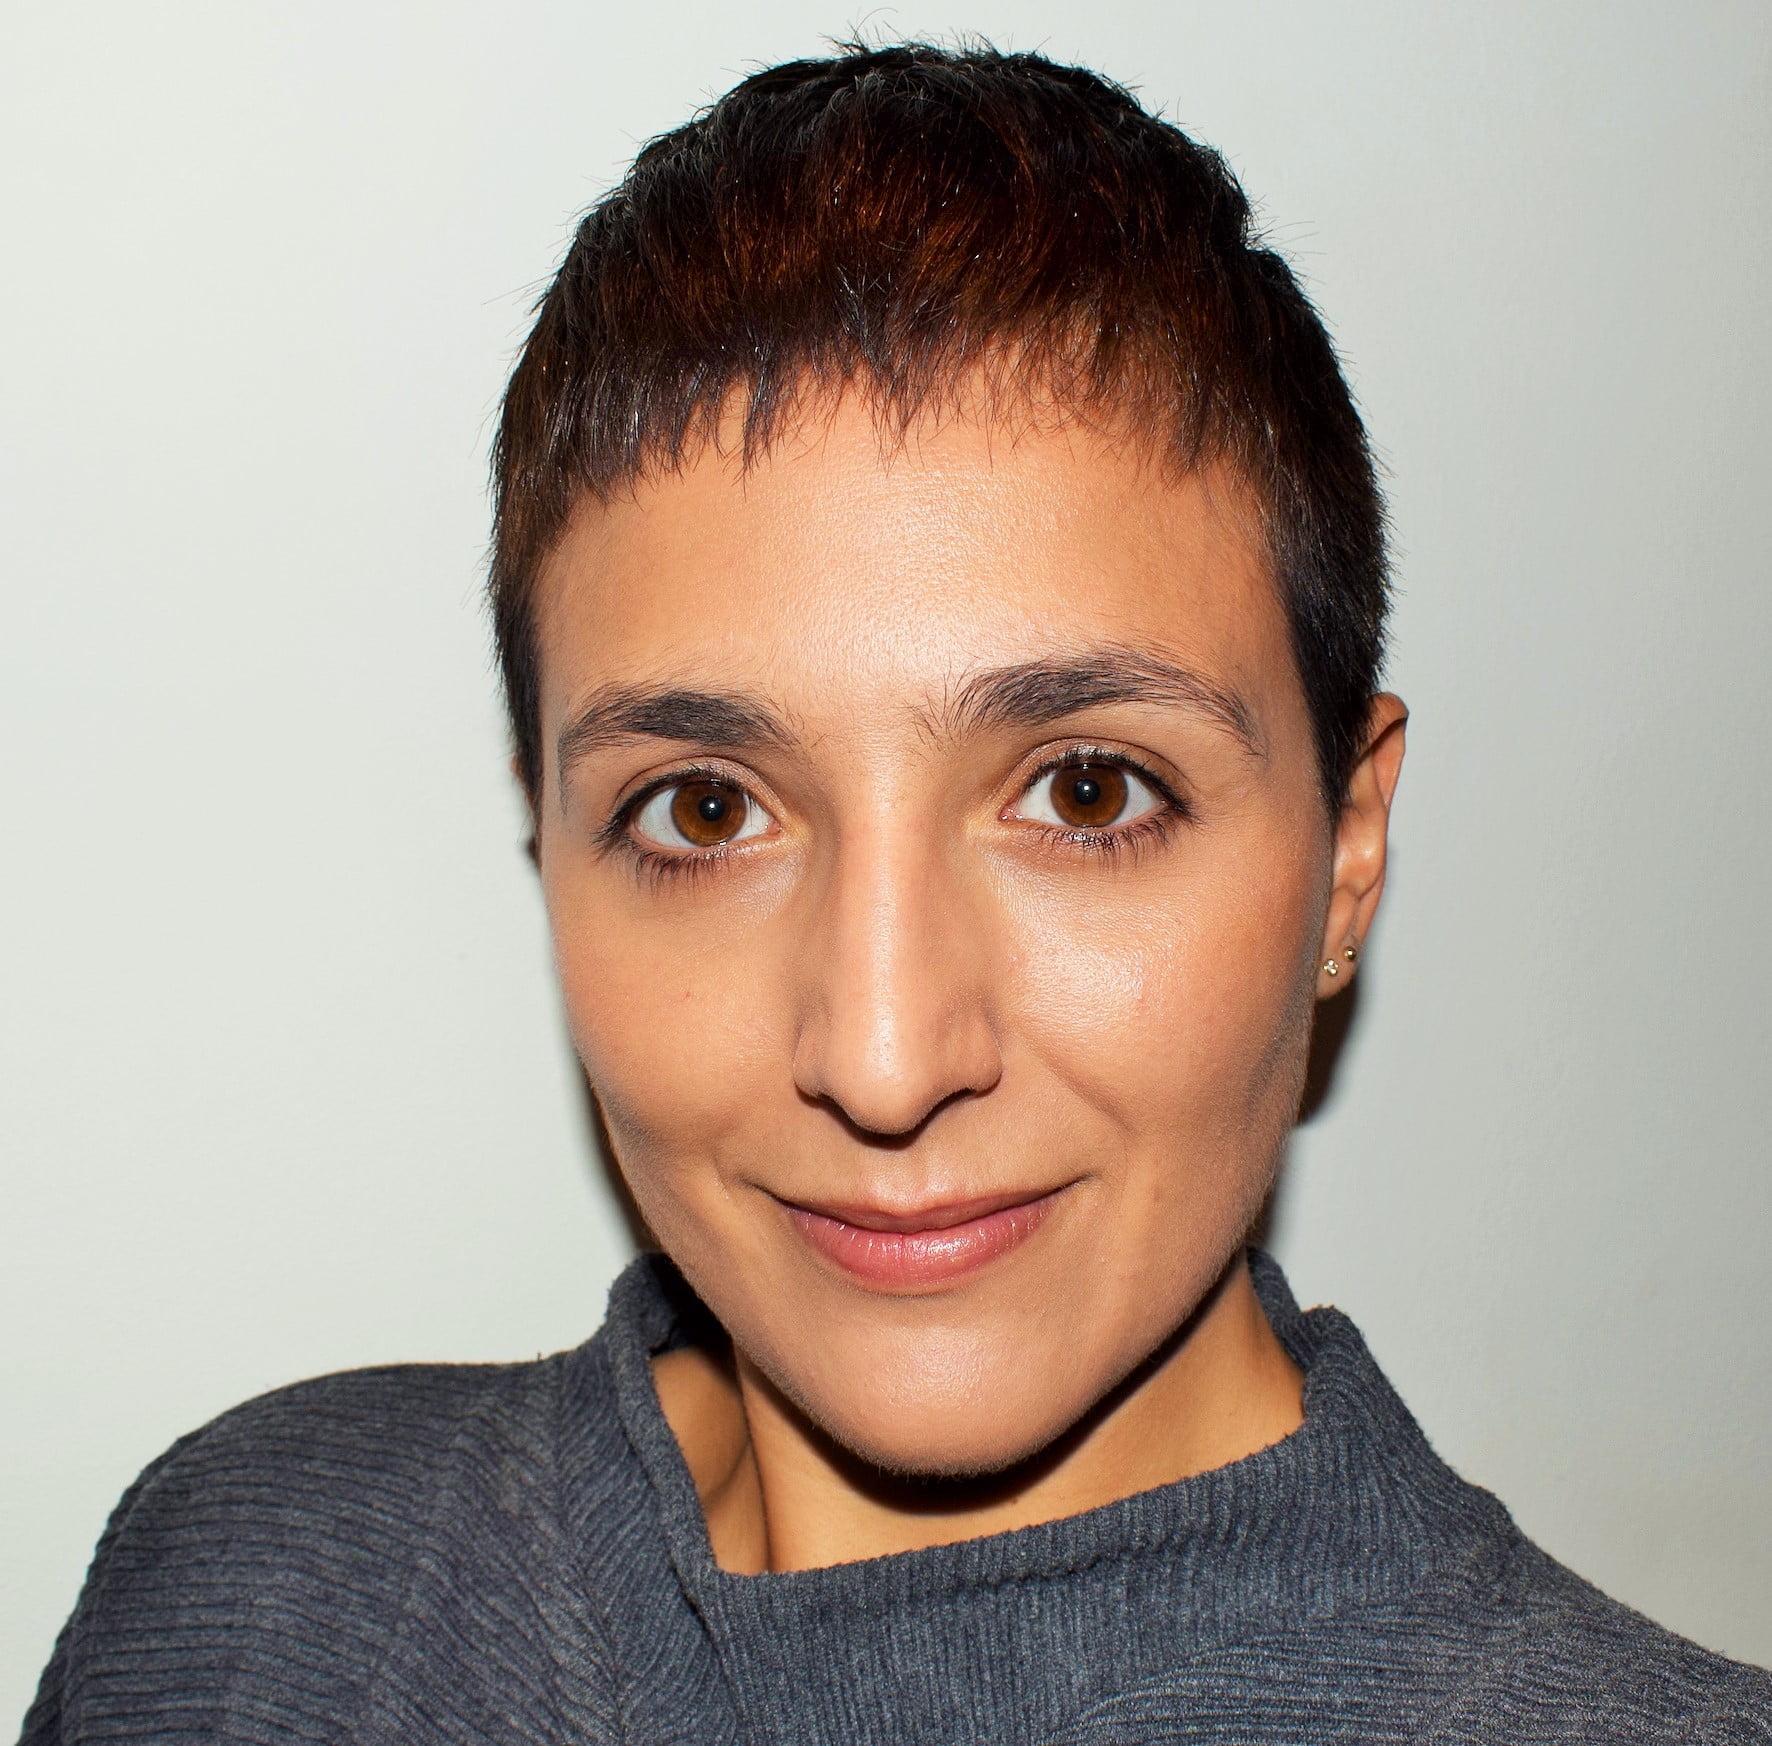 Headshot of Erene Hadjiioannou